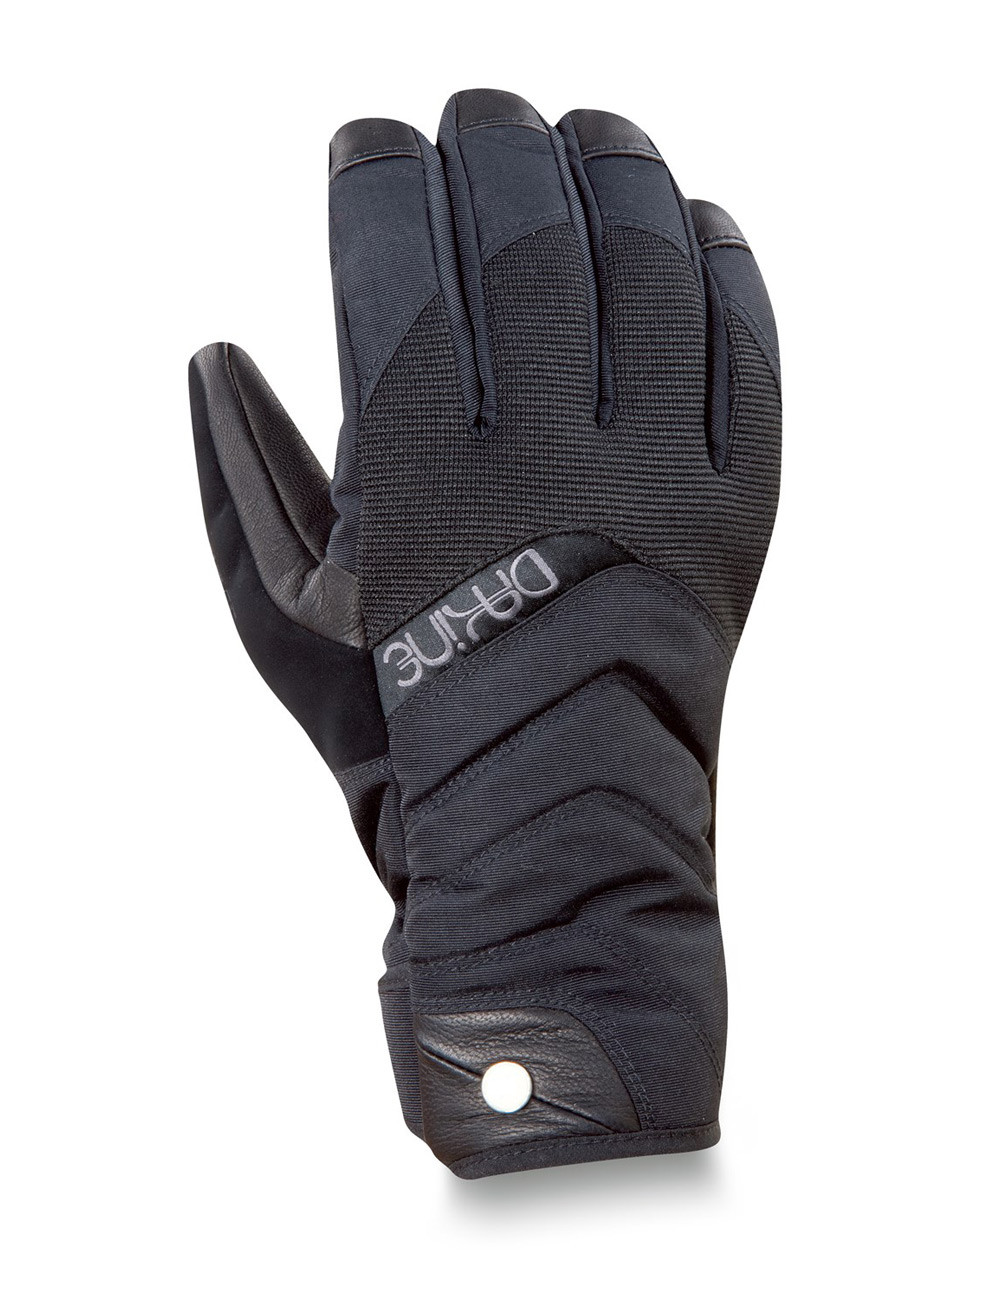 Rękawice snowboardowe Dakine Comet